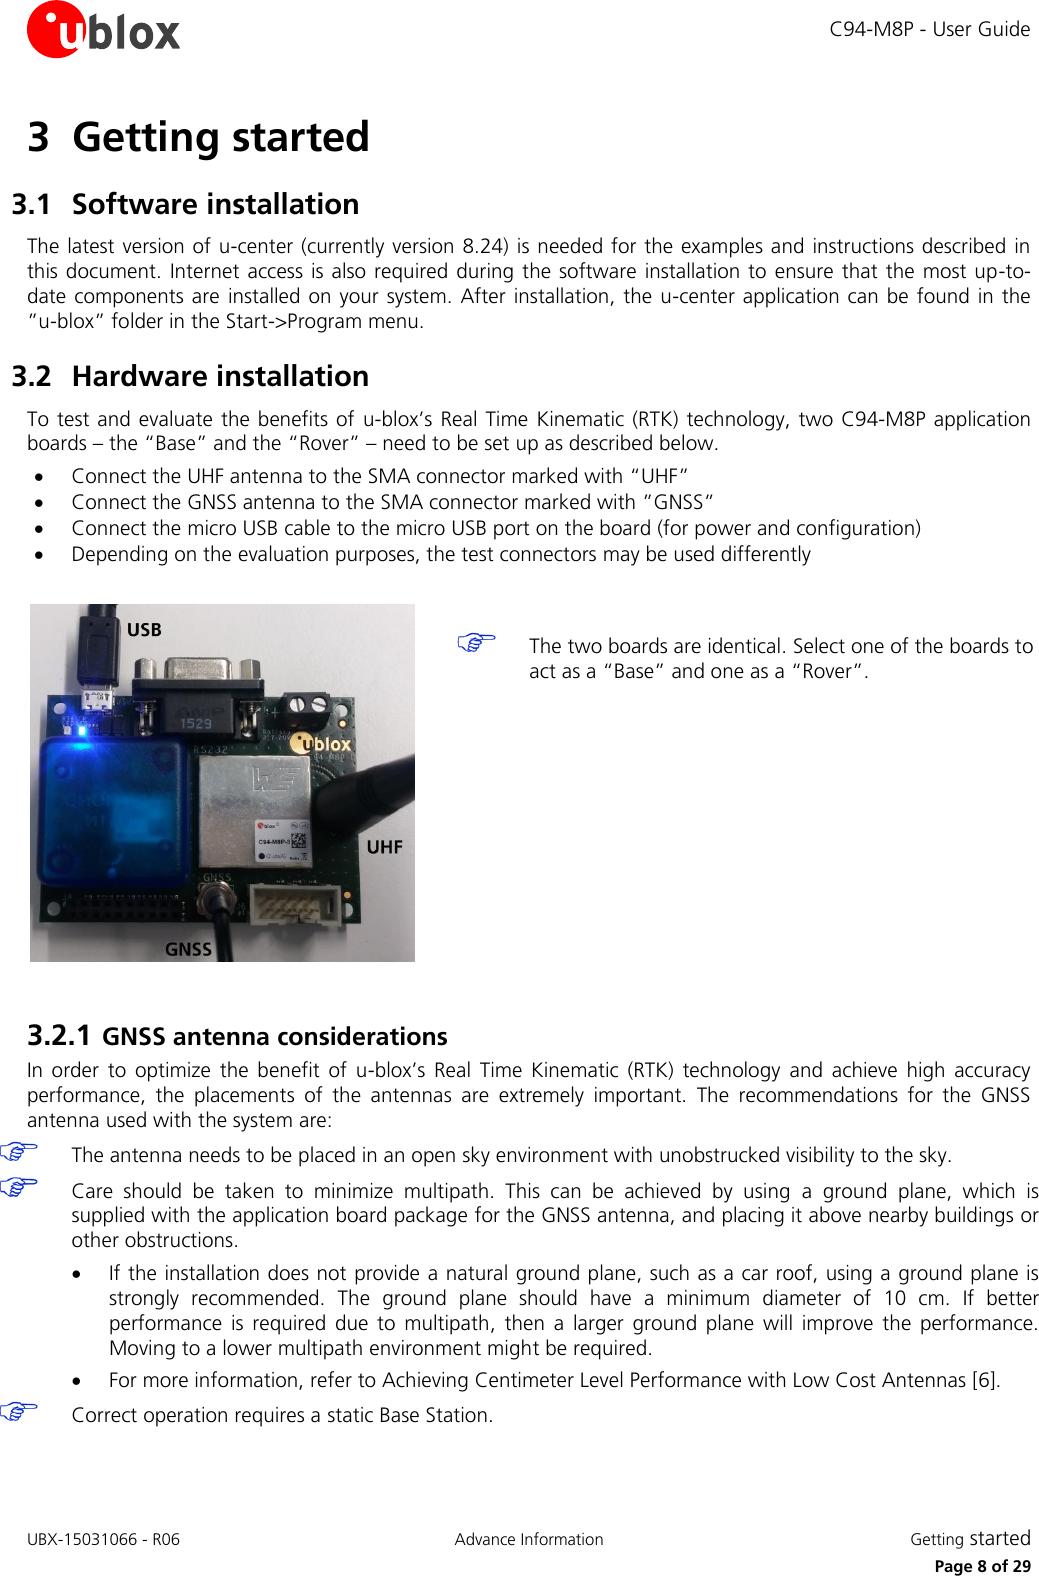 C94 M8P Ublox App Board User Guide (UBX 15031066)